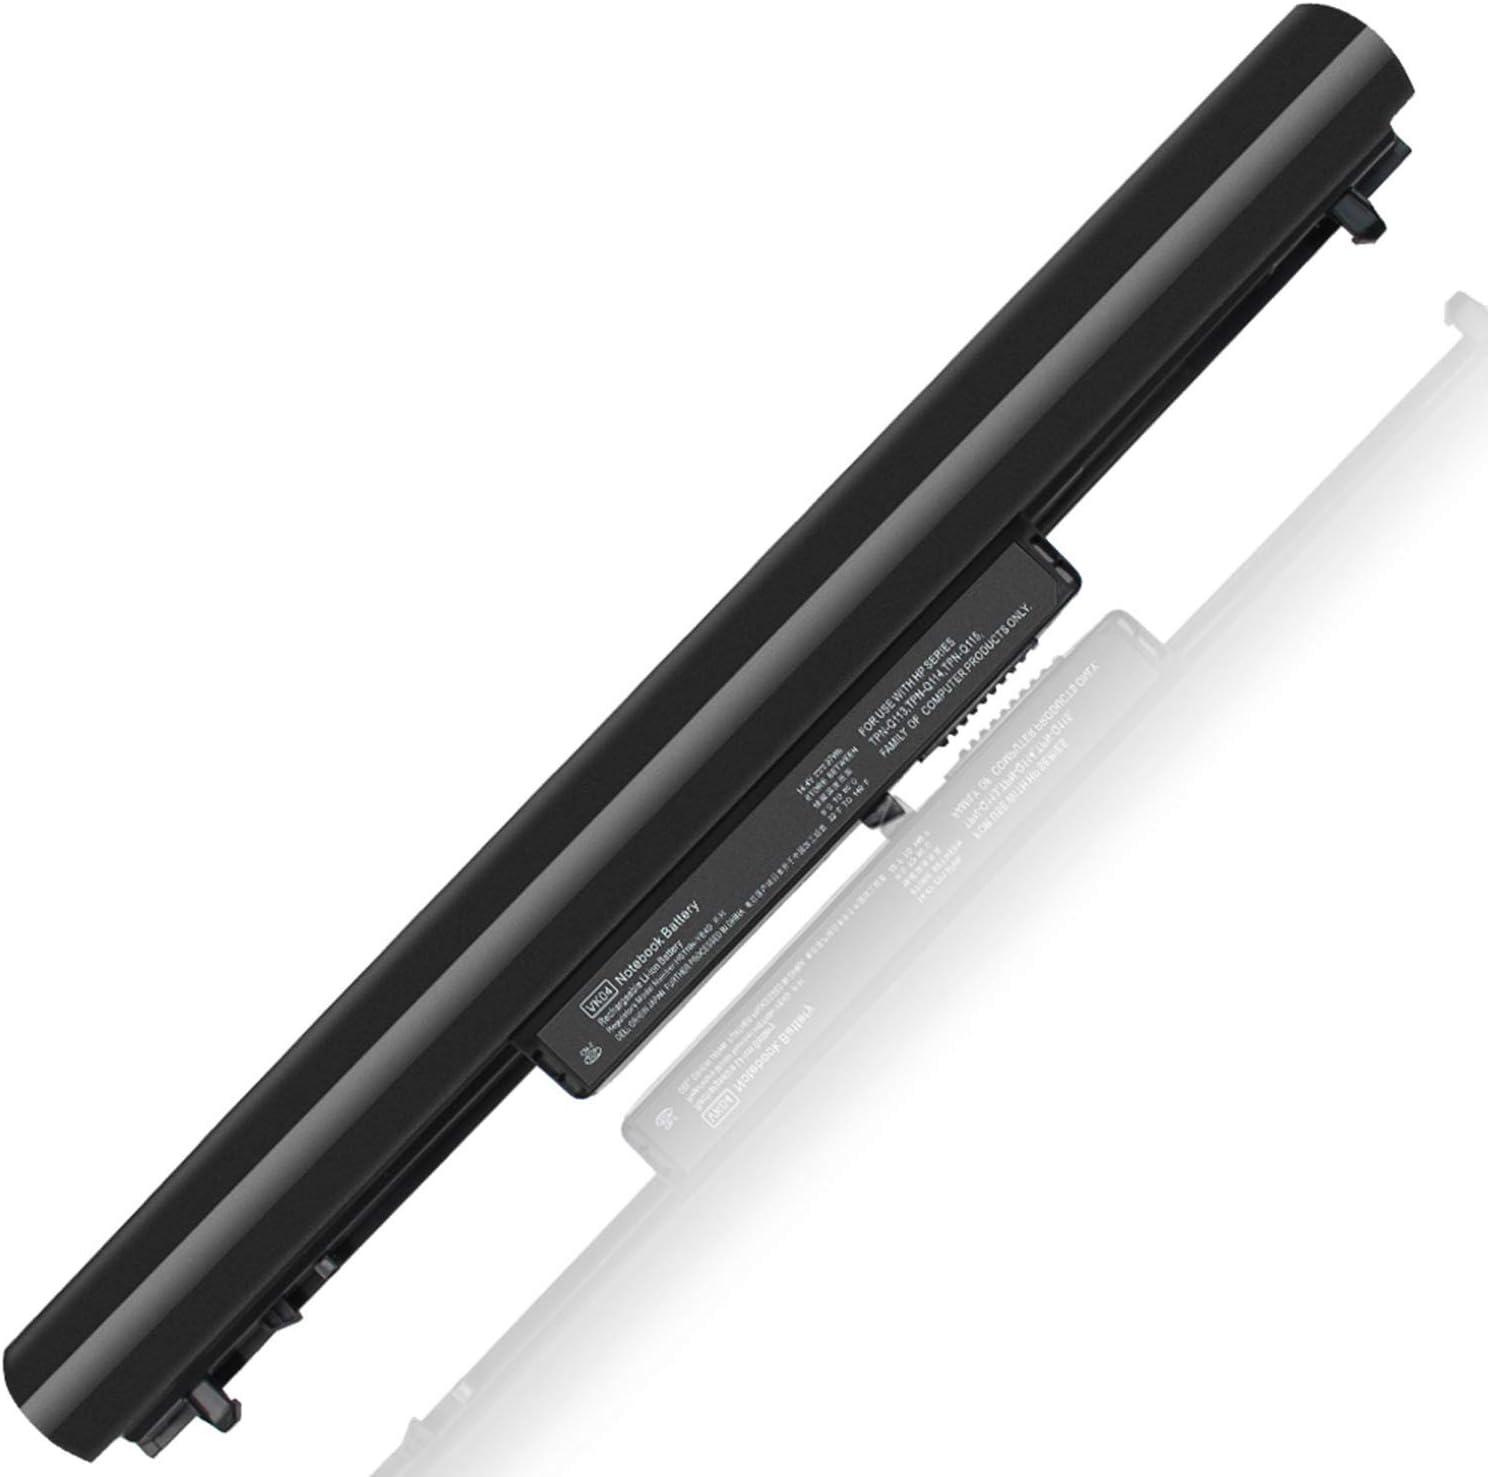 VK04 695192-001 Battery Compatible with Hp 694864-851 HSTNN-YB4D HSTNN-DB4D TPN-Q113 TPN-Q114 H4Q45AA Pavilion Sleekbook 14-B000 14-B109wm 15-b142dx 14-b124us 14-b137ca 14-b120dx 14-b150us 14-b173cl